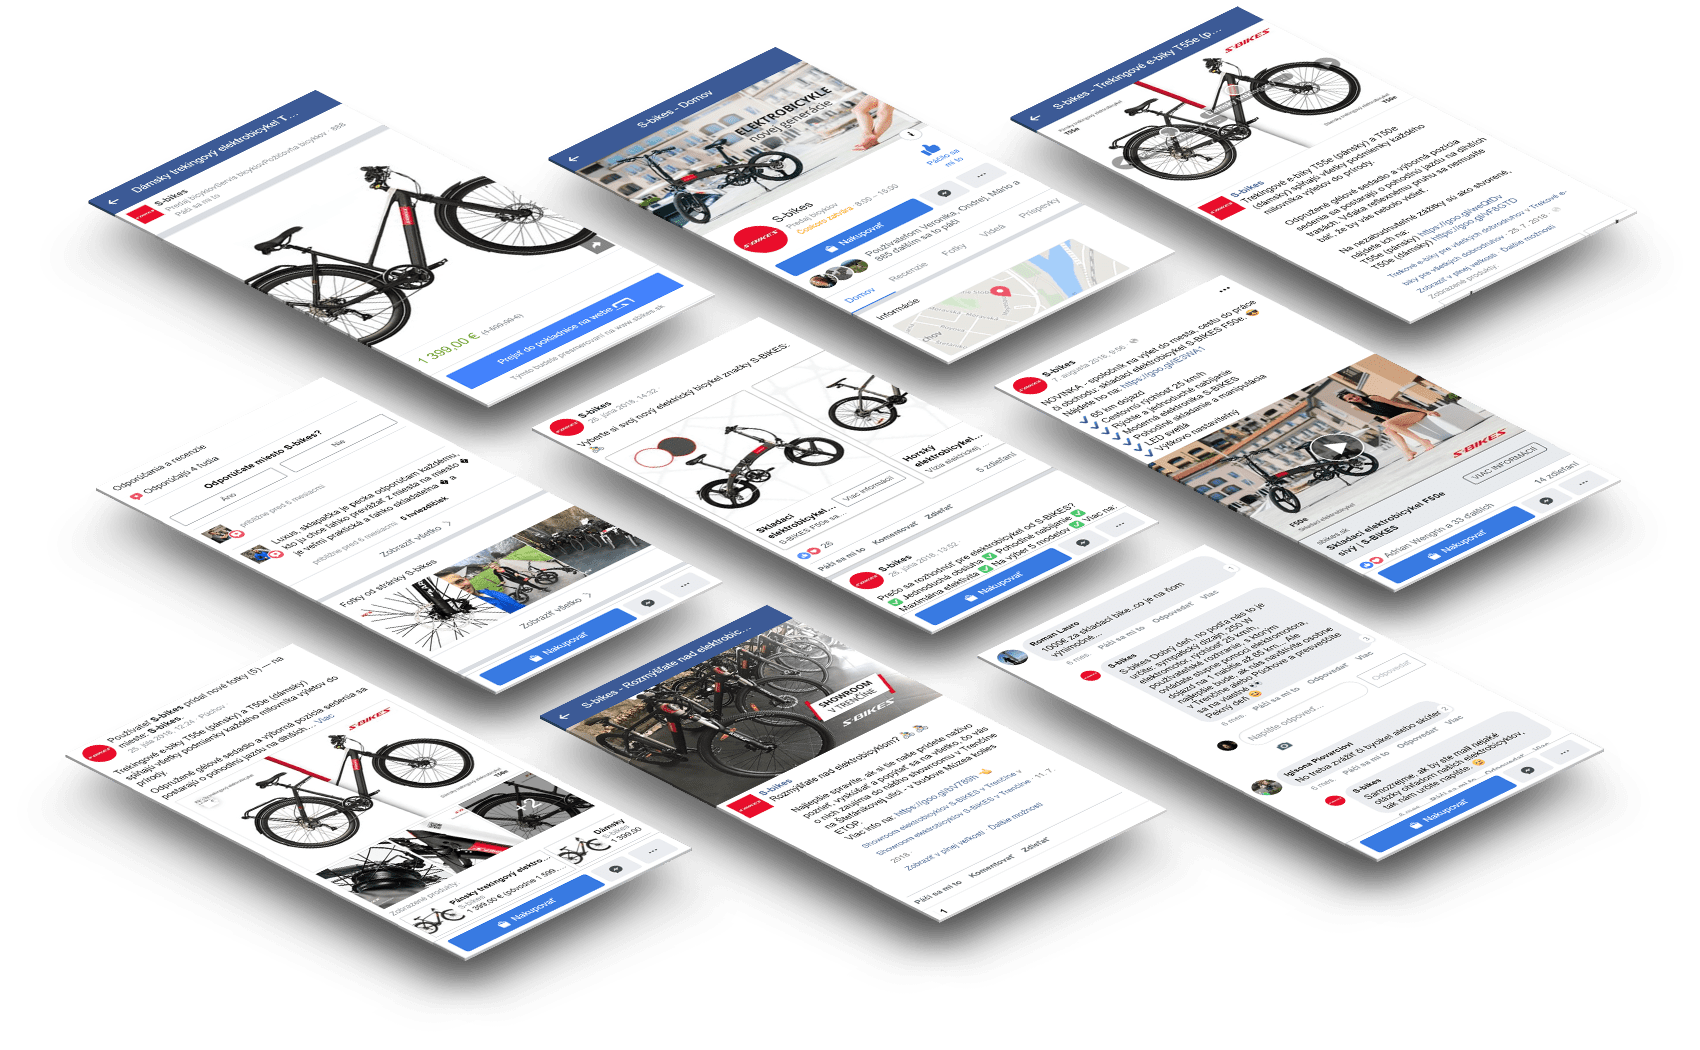 referencia S-bikes facebook